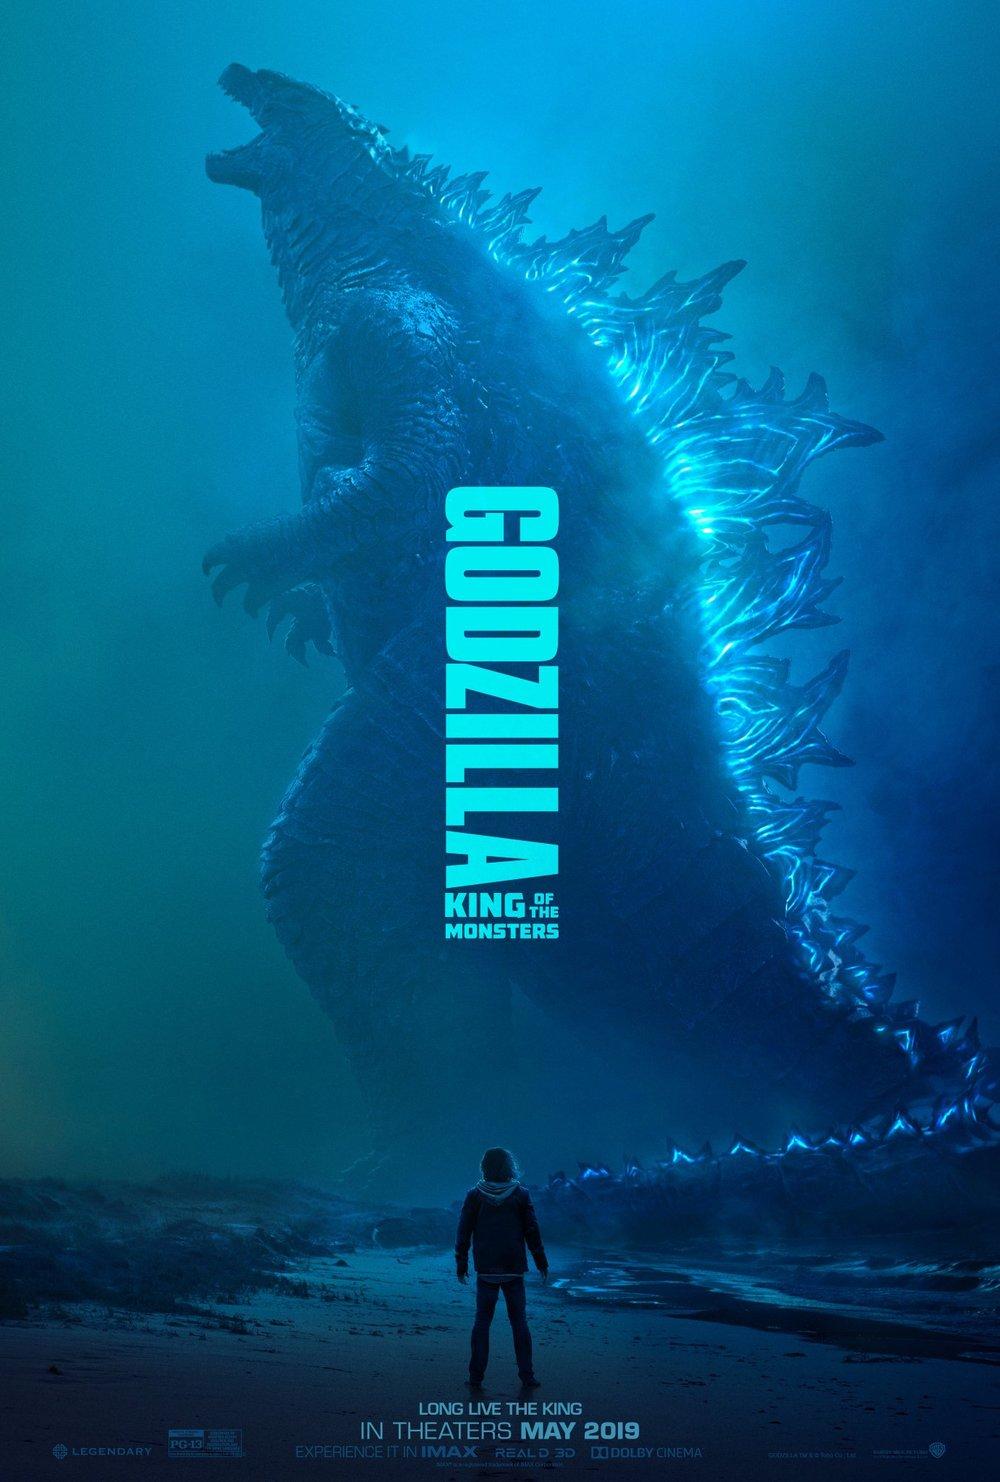 @GodzillaMovie